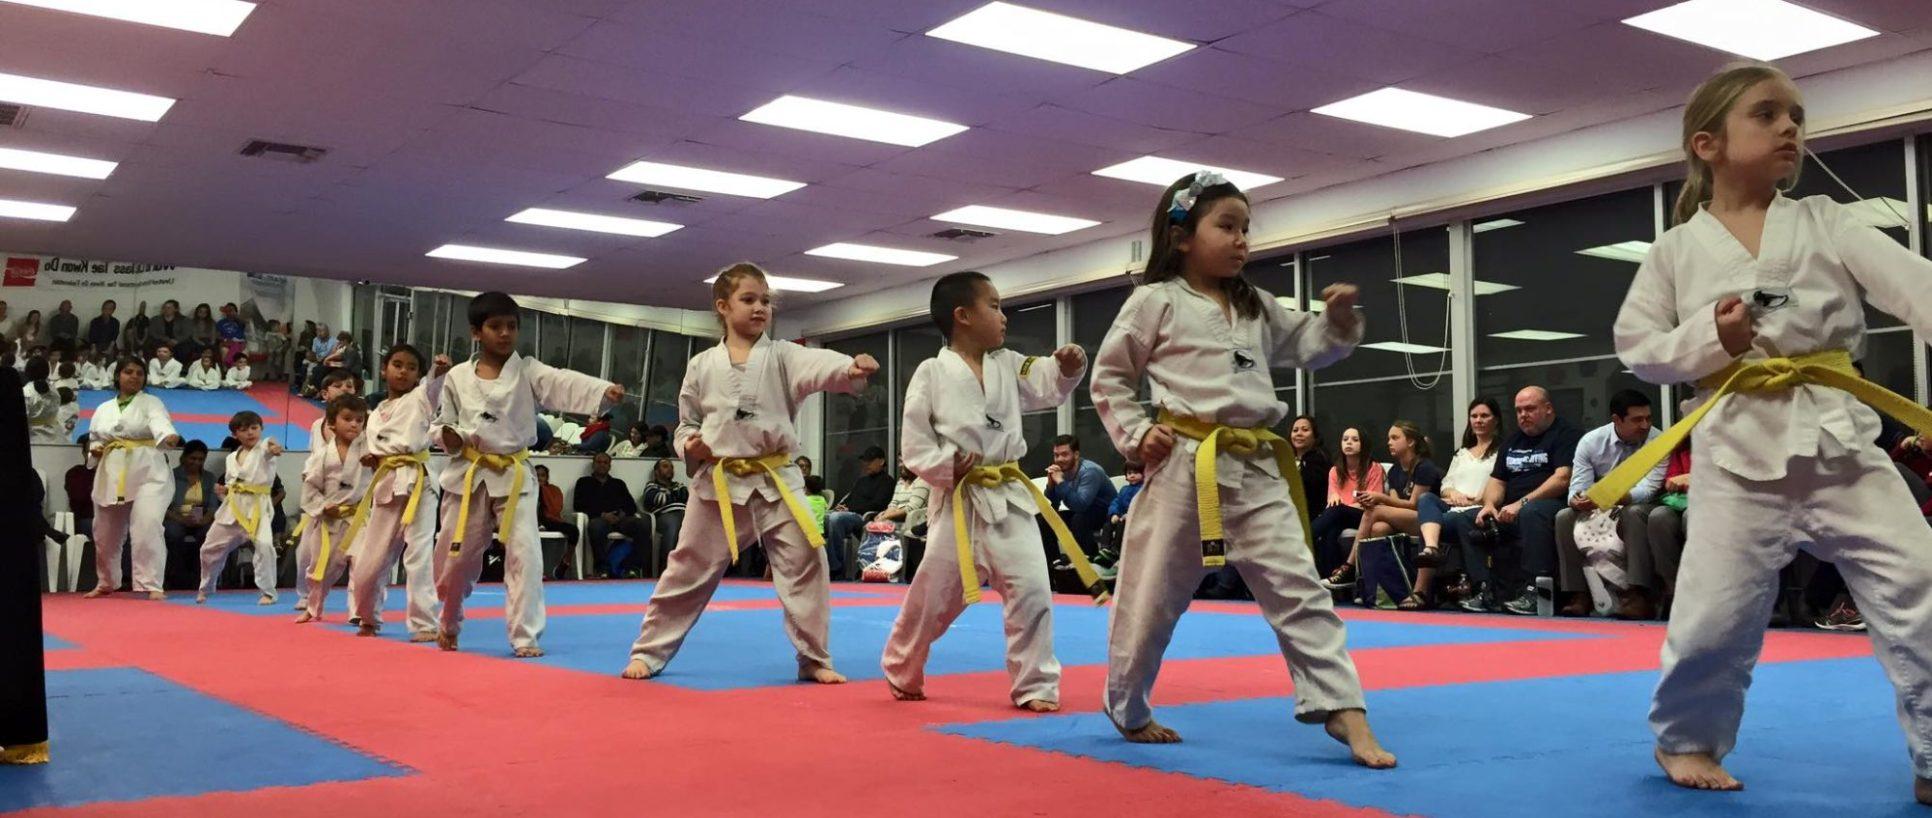 Texas' Top Rated Local® Martial Arts School Award Winner: National School of Martial Arts